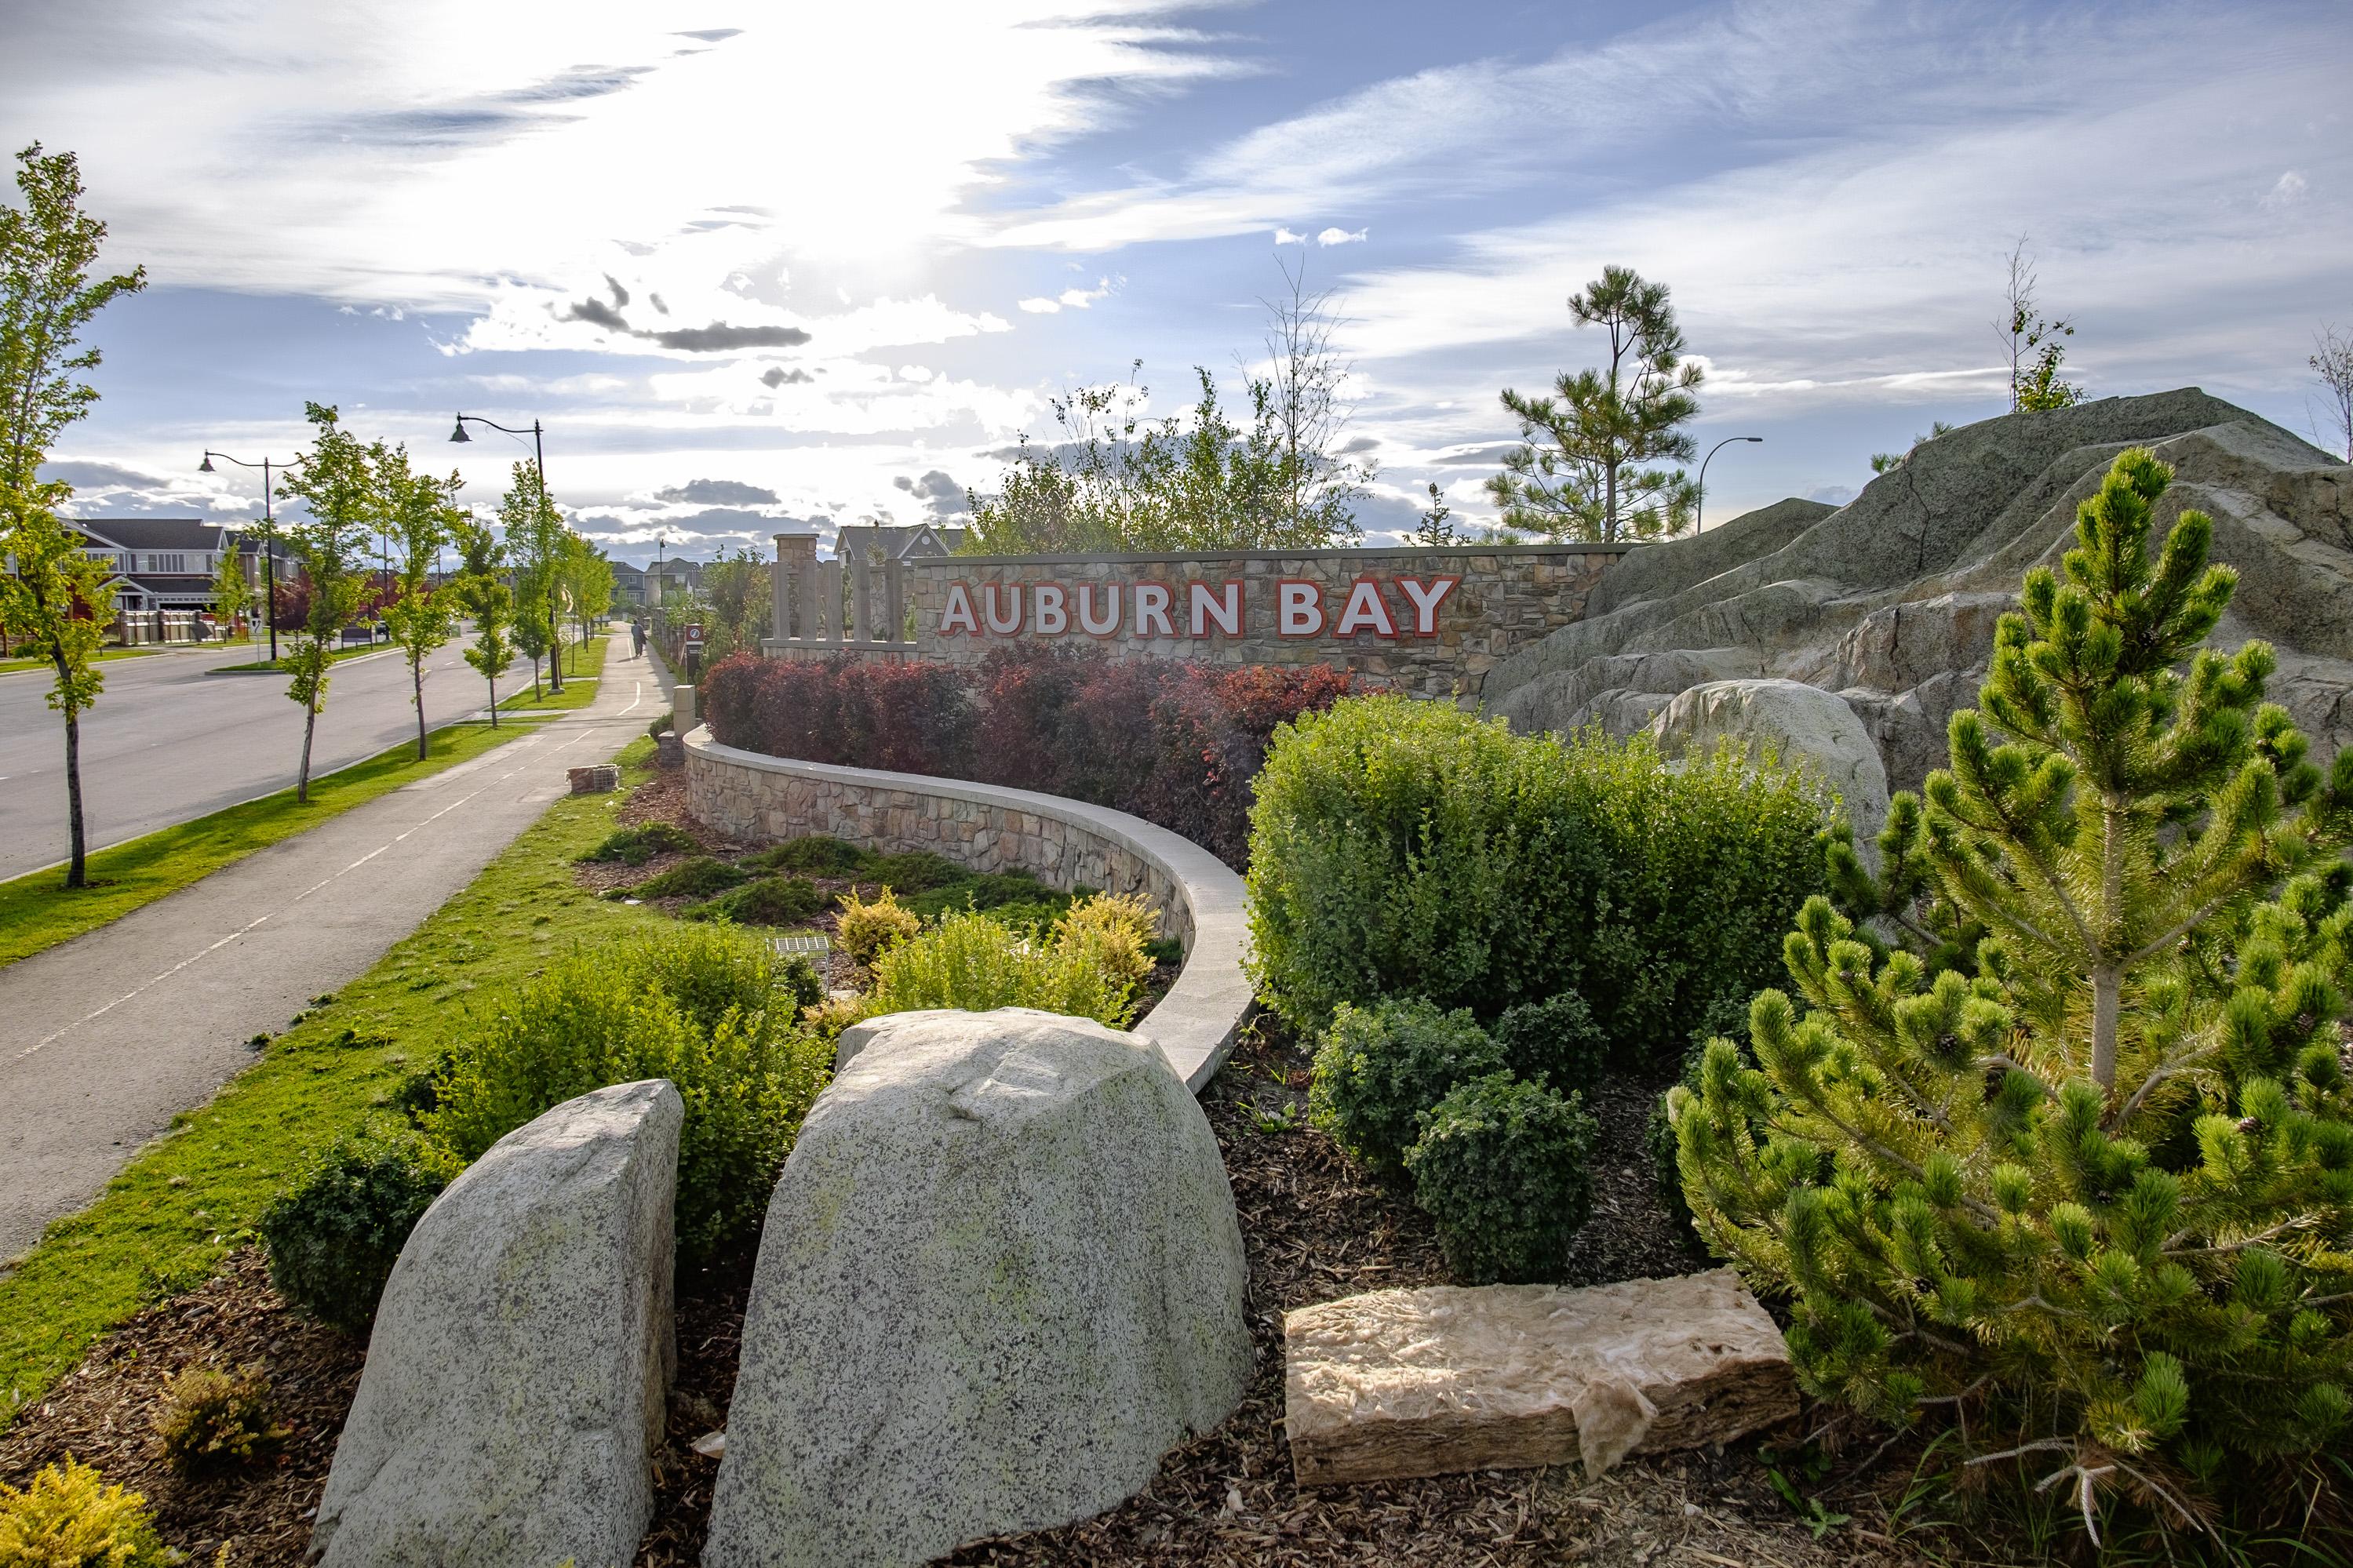 Image: Auburn Bay / Pressboard